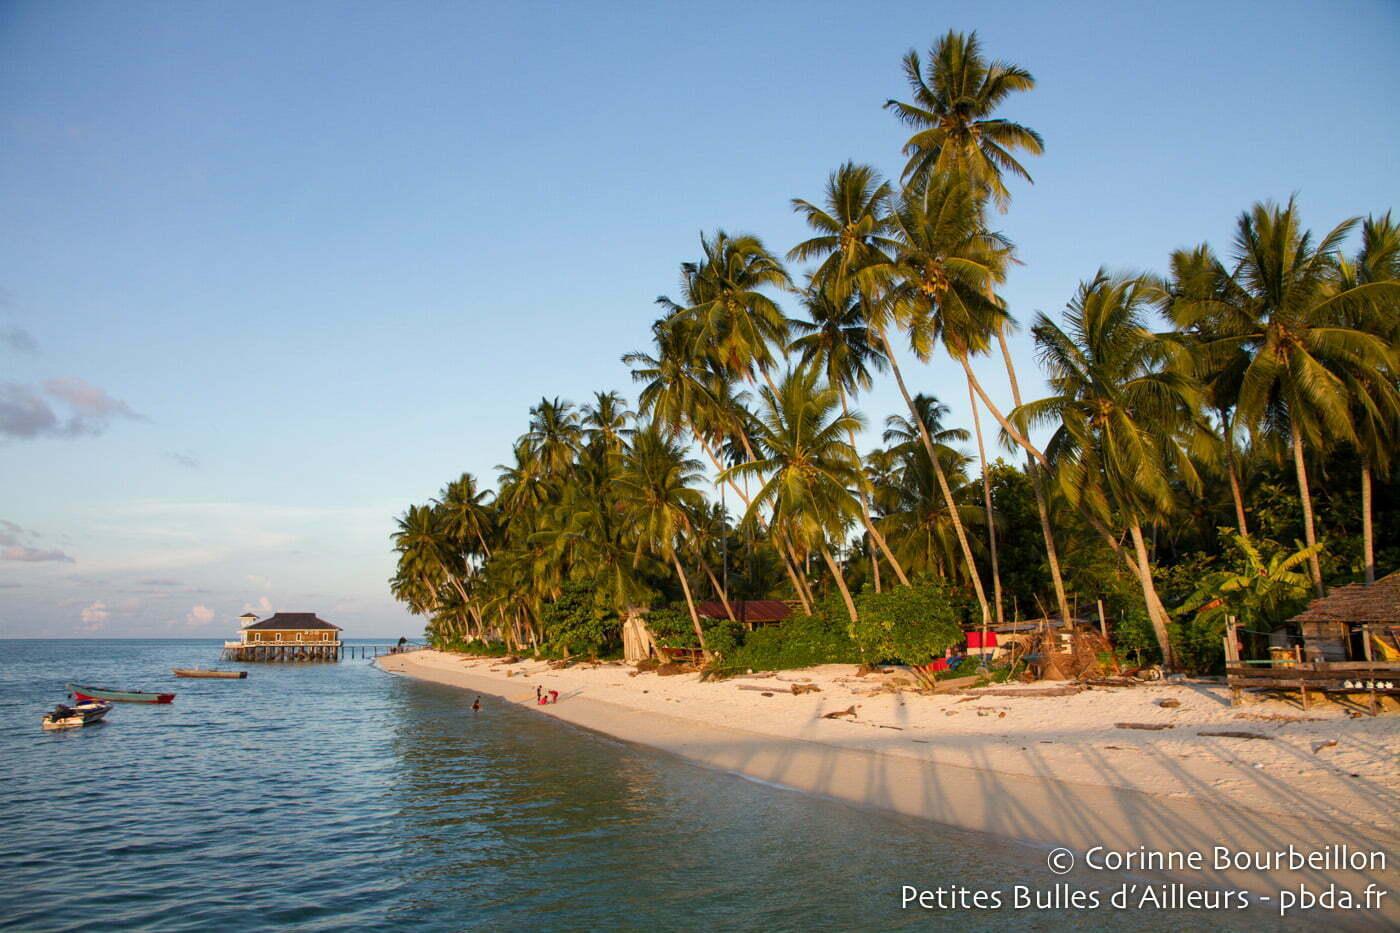 Derawan Island. Borneo, Indonesia. July 2013.